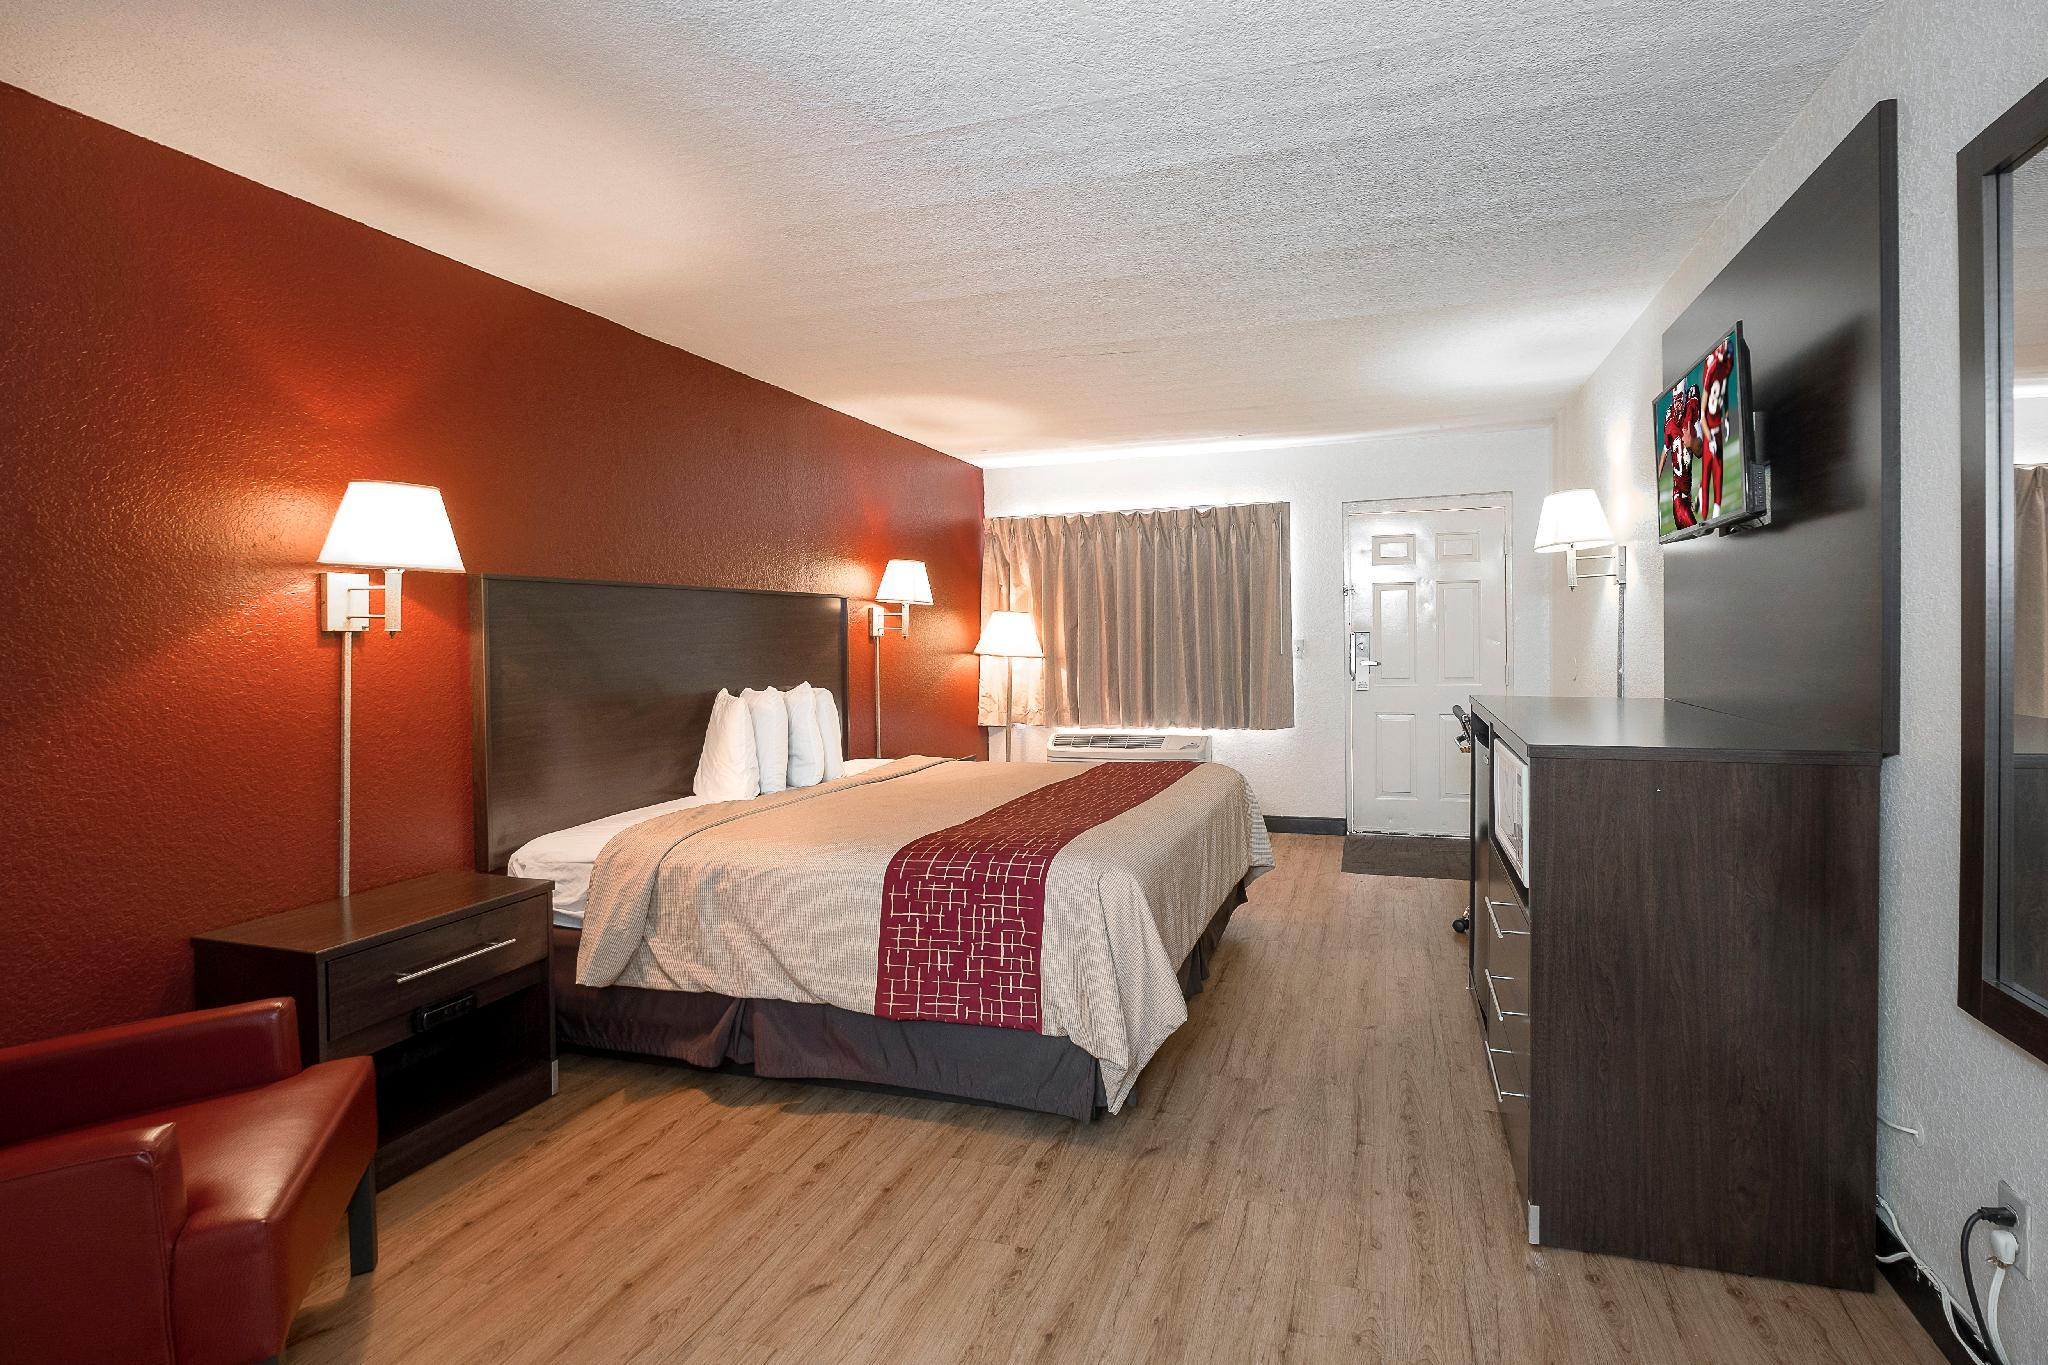 Red Roof Inn Ft Pierce In Fort Pierce Fl Room Deals